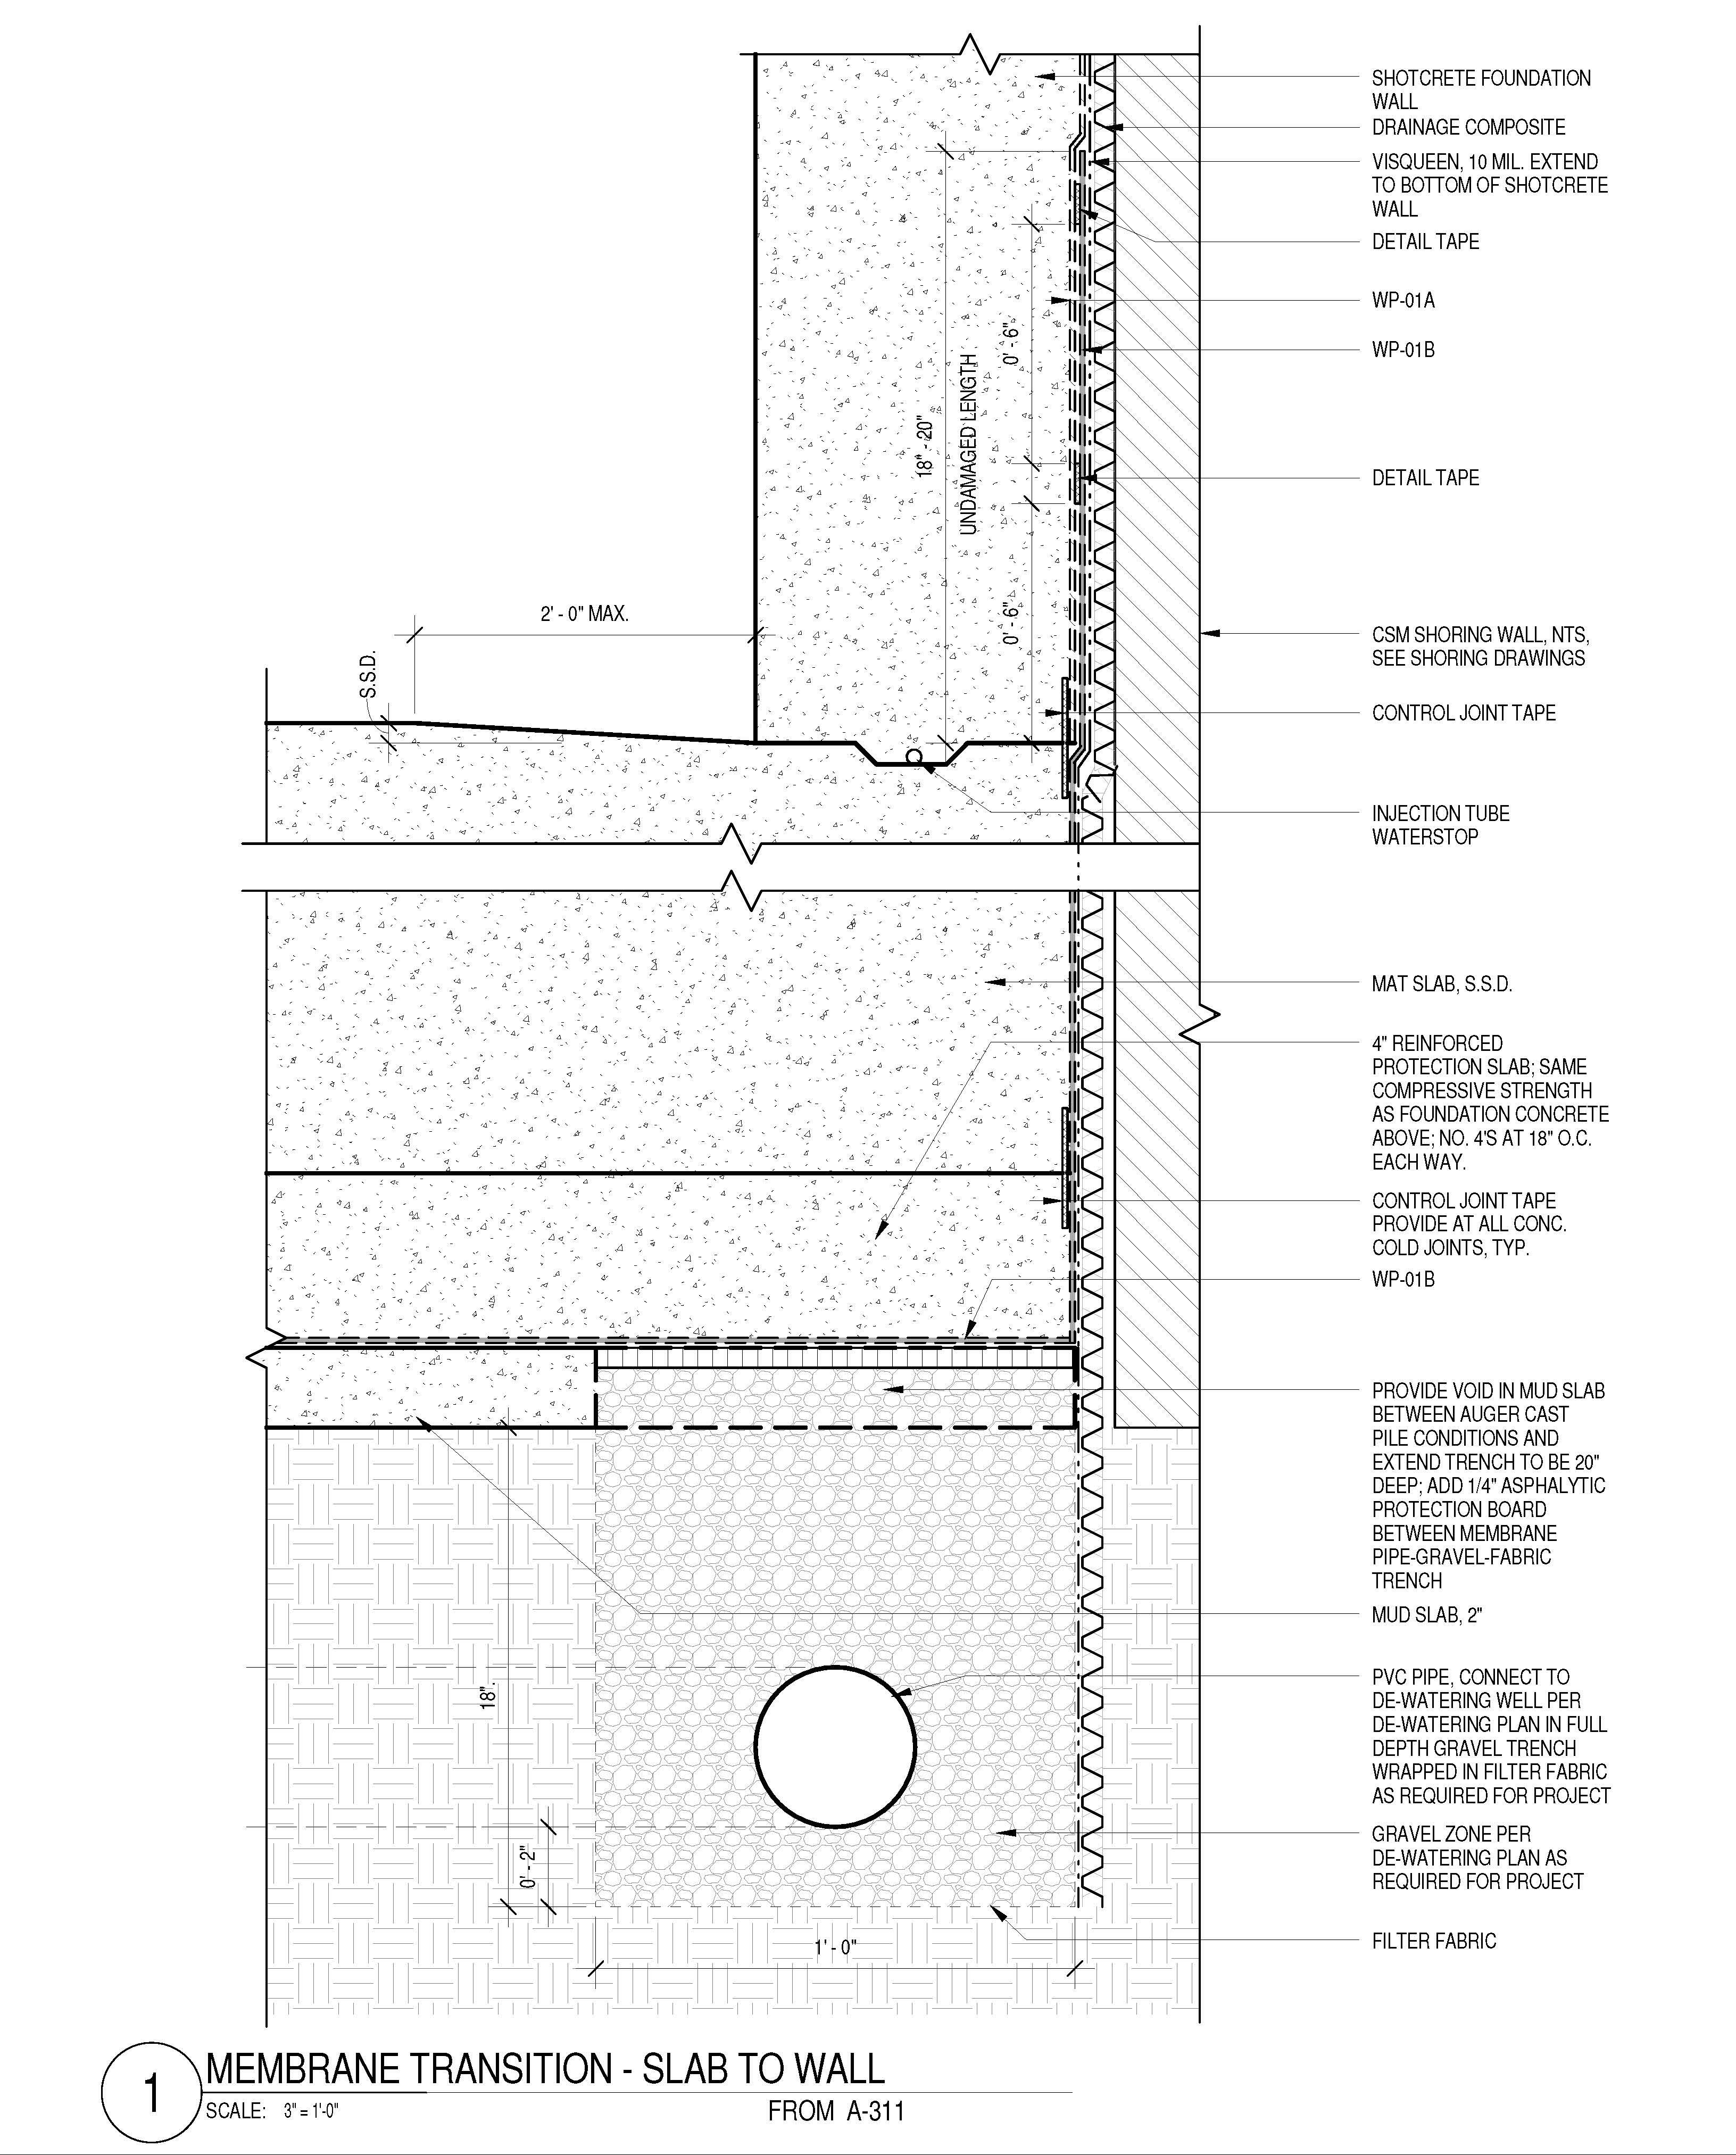 Water Proofing Applications Aquatic Mechanical Engineering 800 766 5259